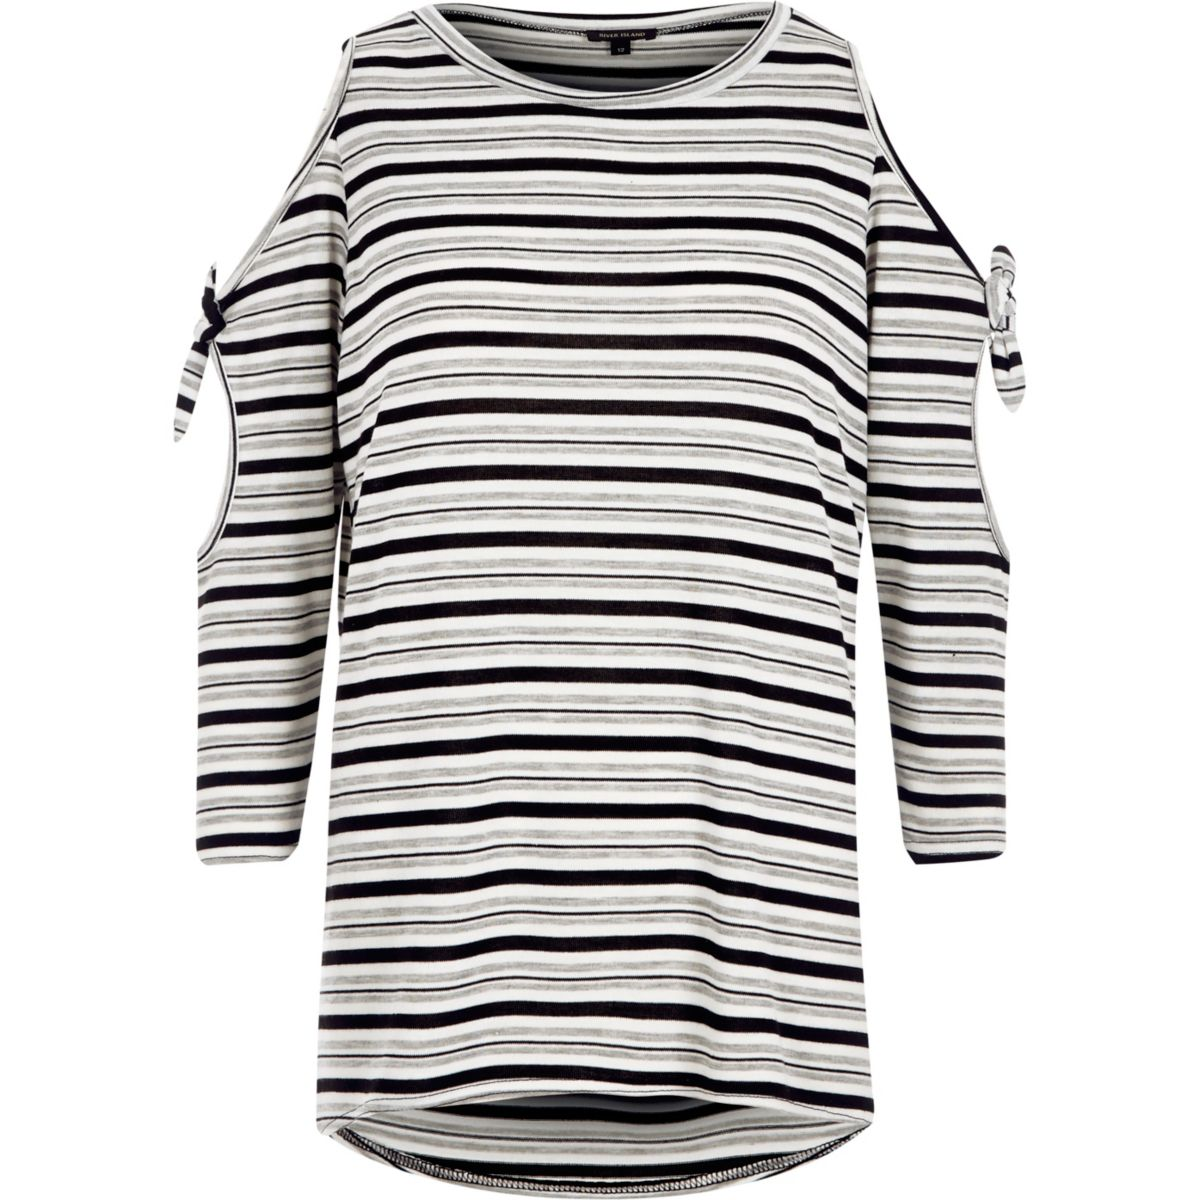 Grey knit stripe cold shoulder tie sleeve top